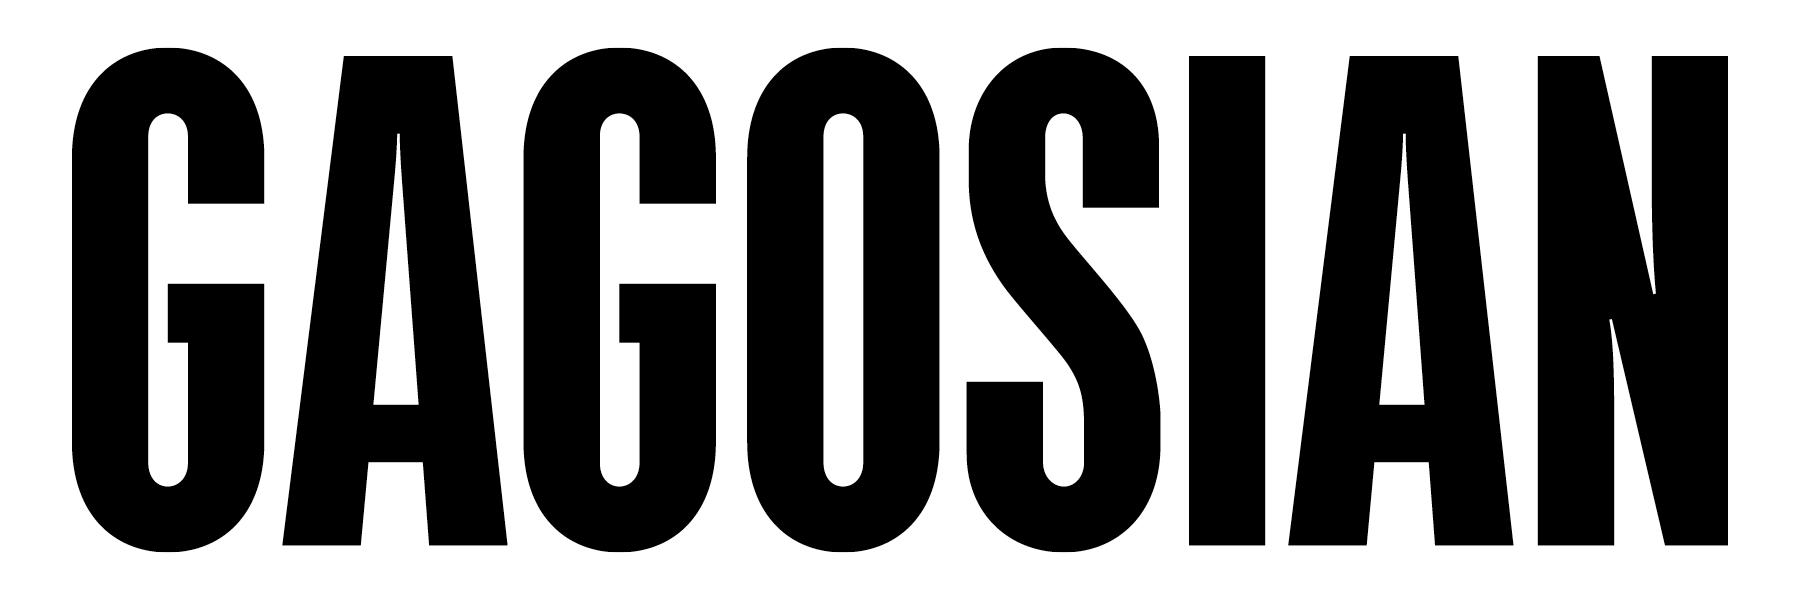 EdW_psalm_logos_2-3.png